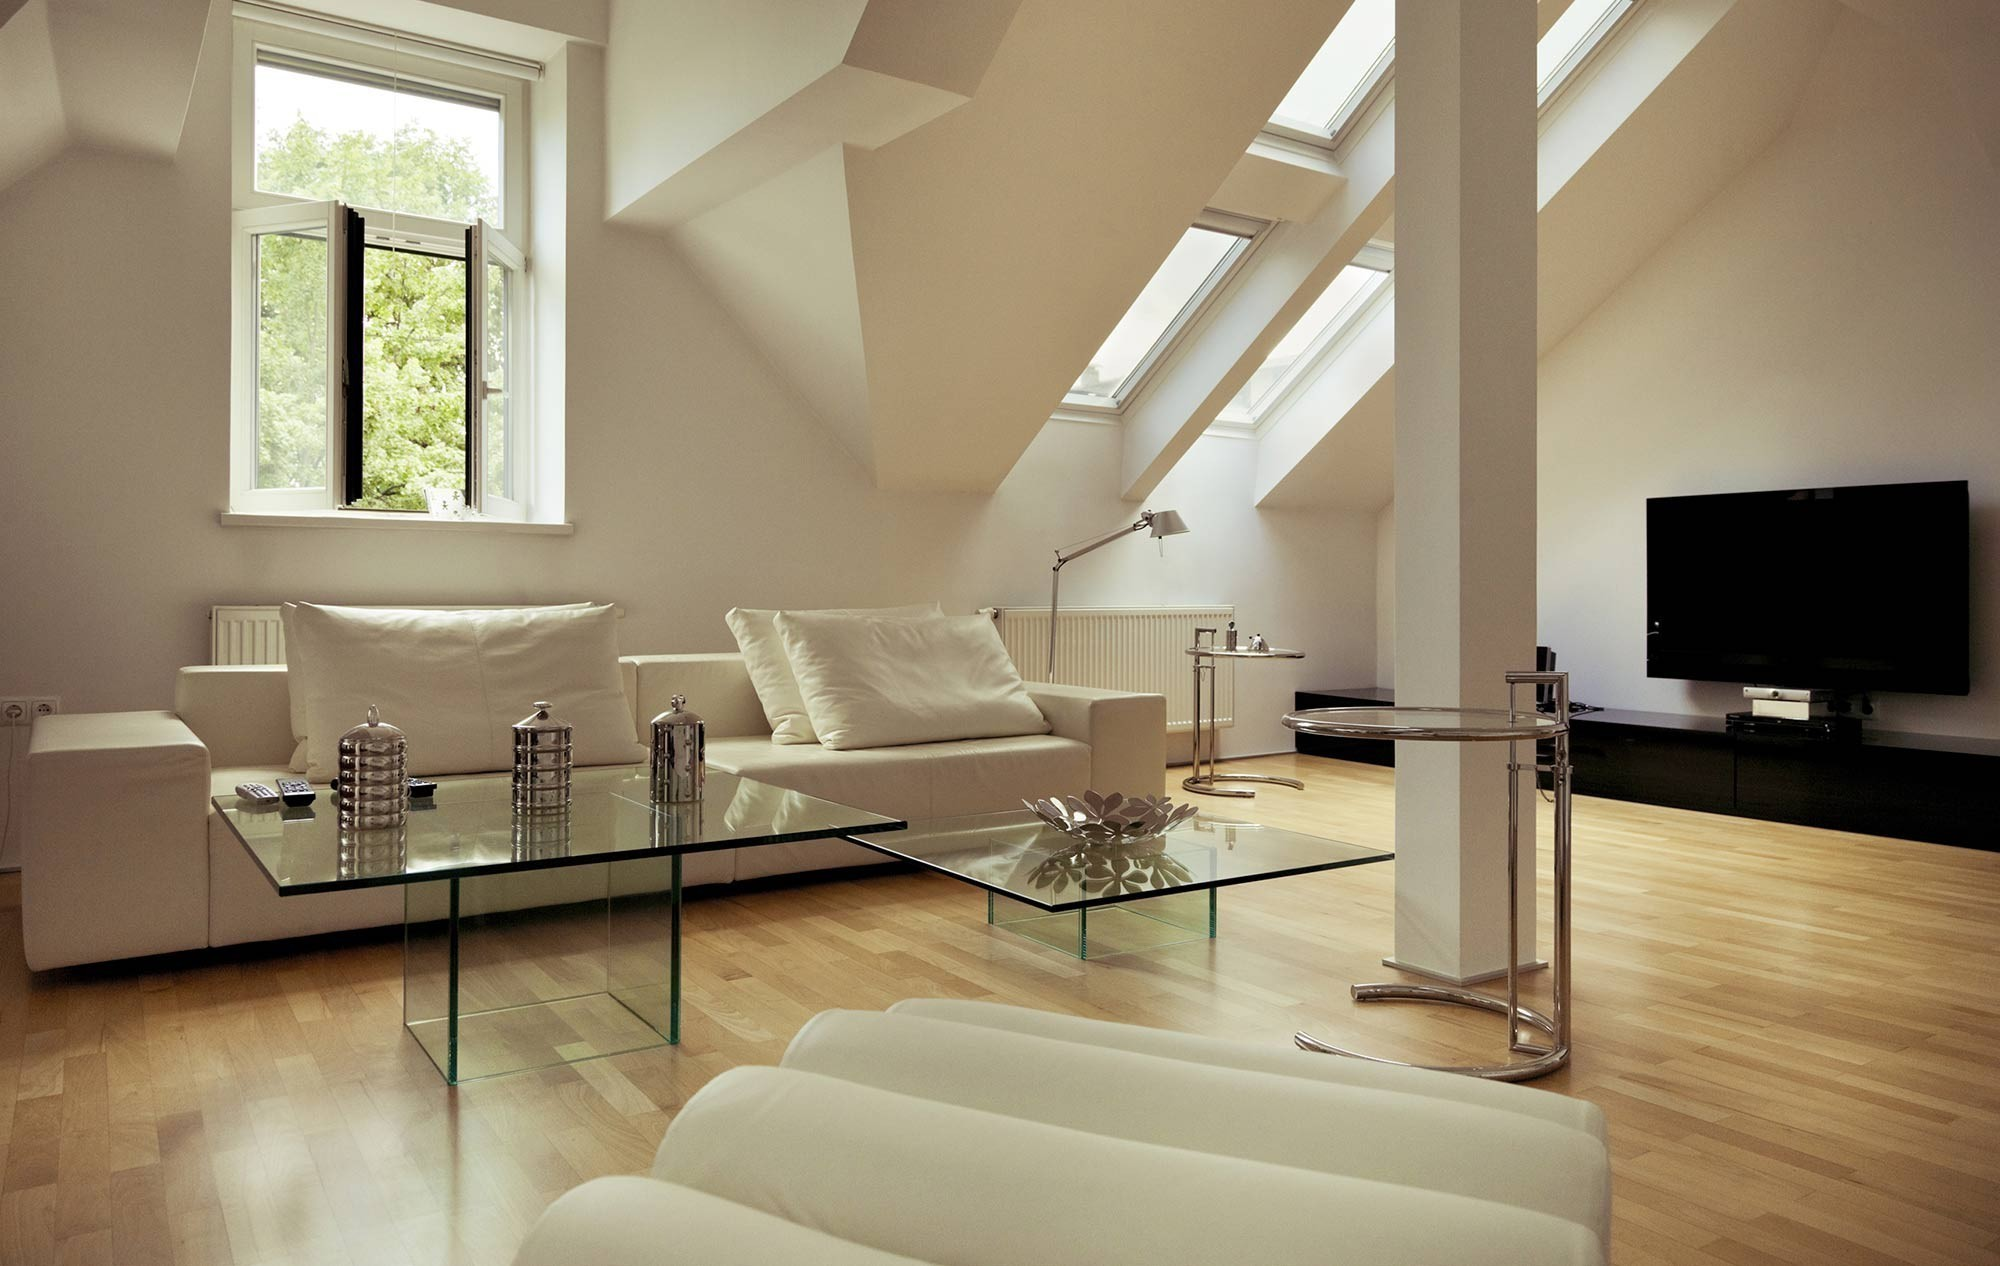 how to build a dormer loft conversion